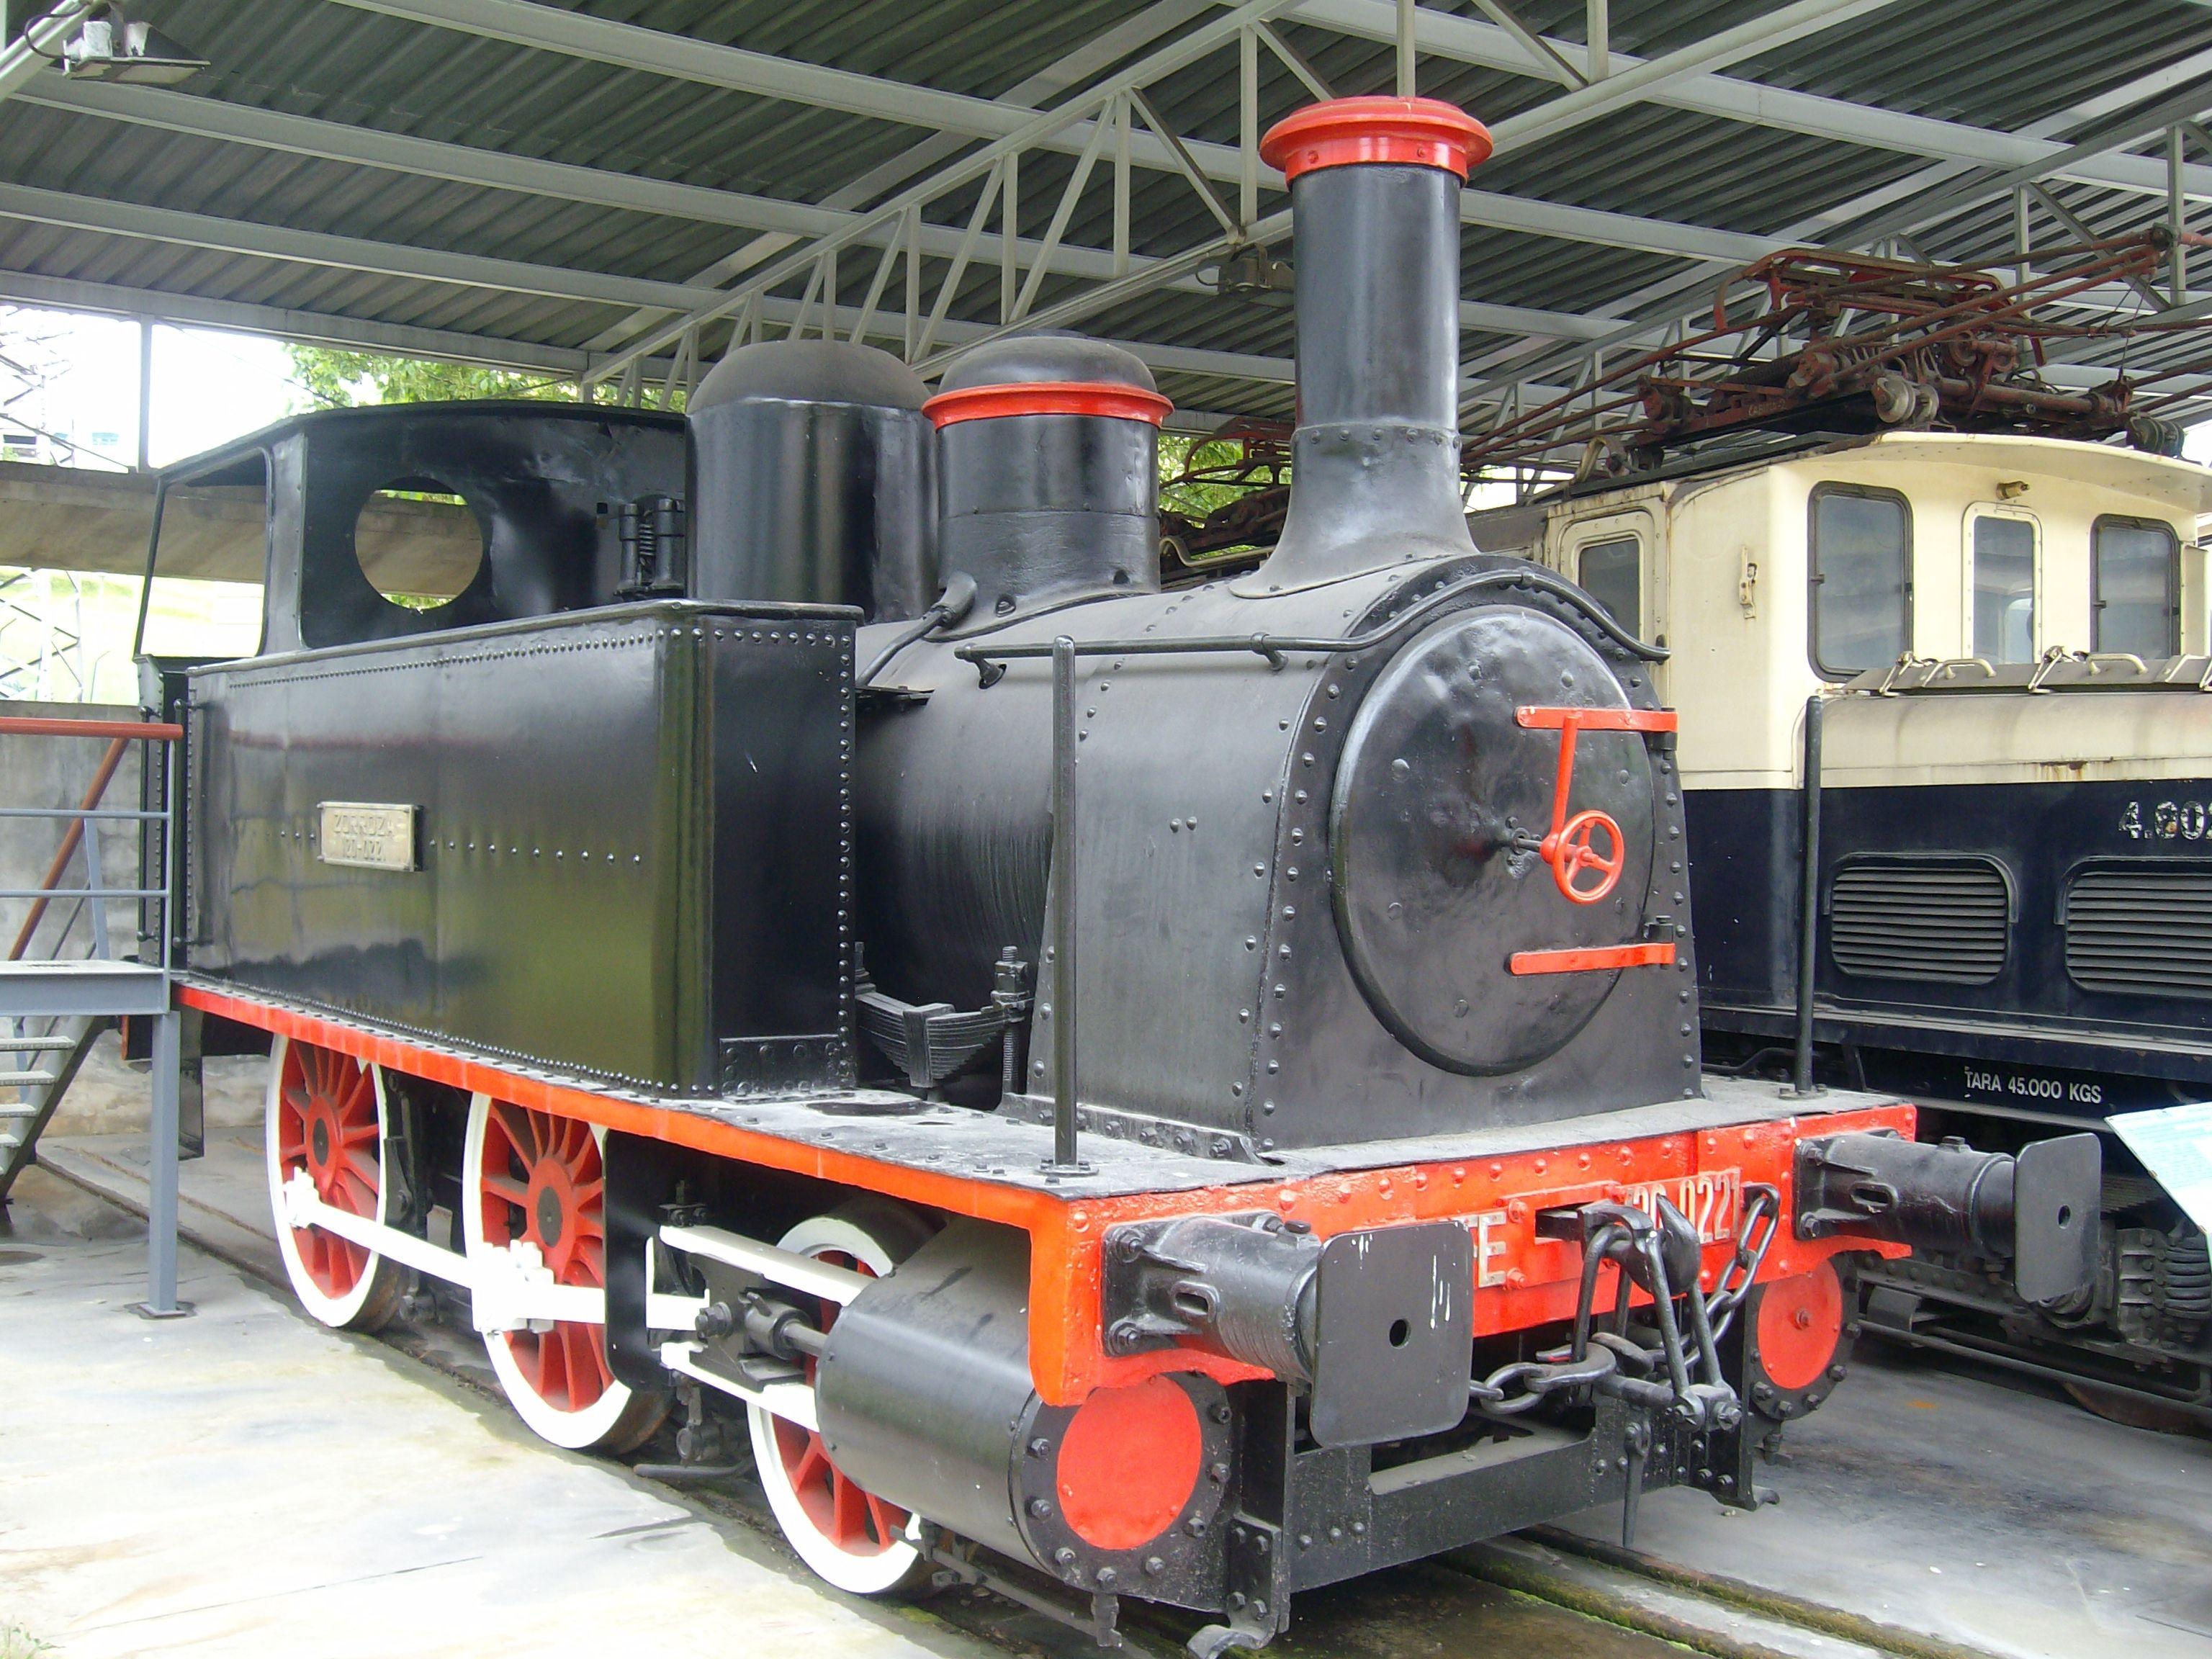 Locomotora de vapor Zorroza